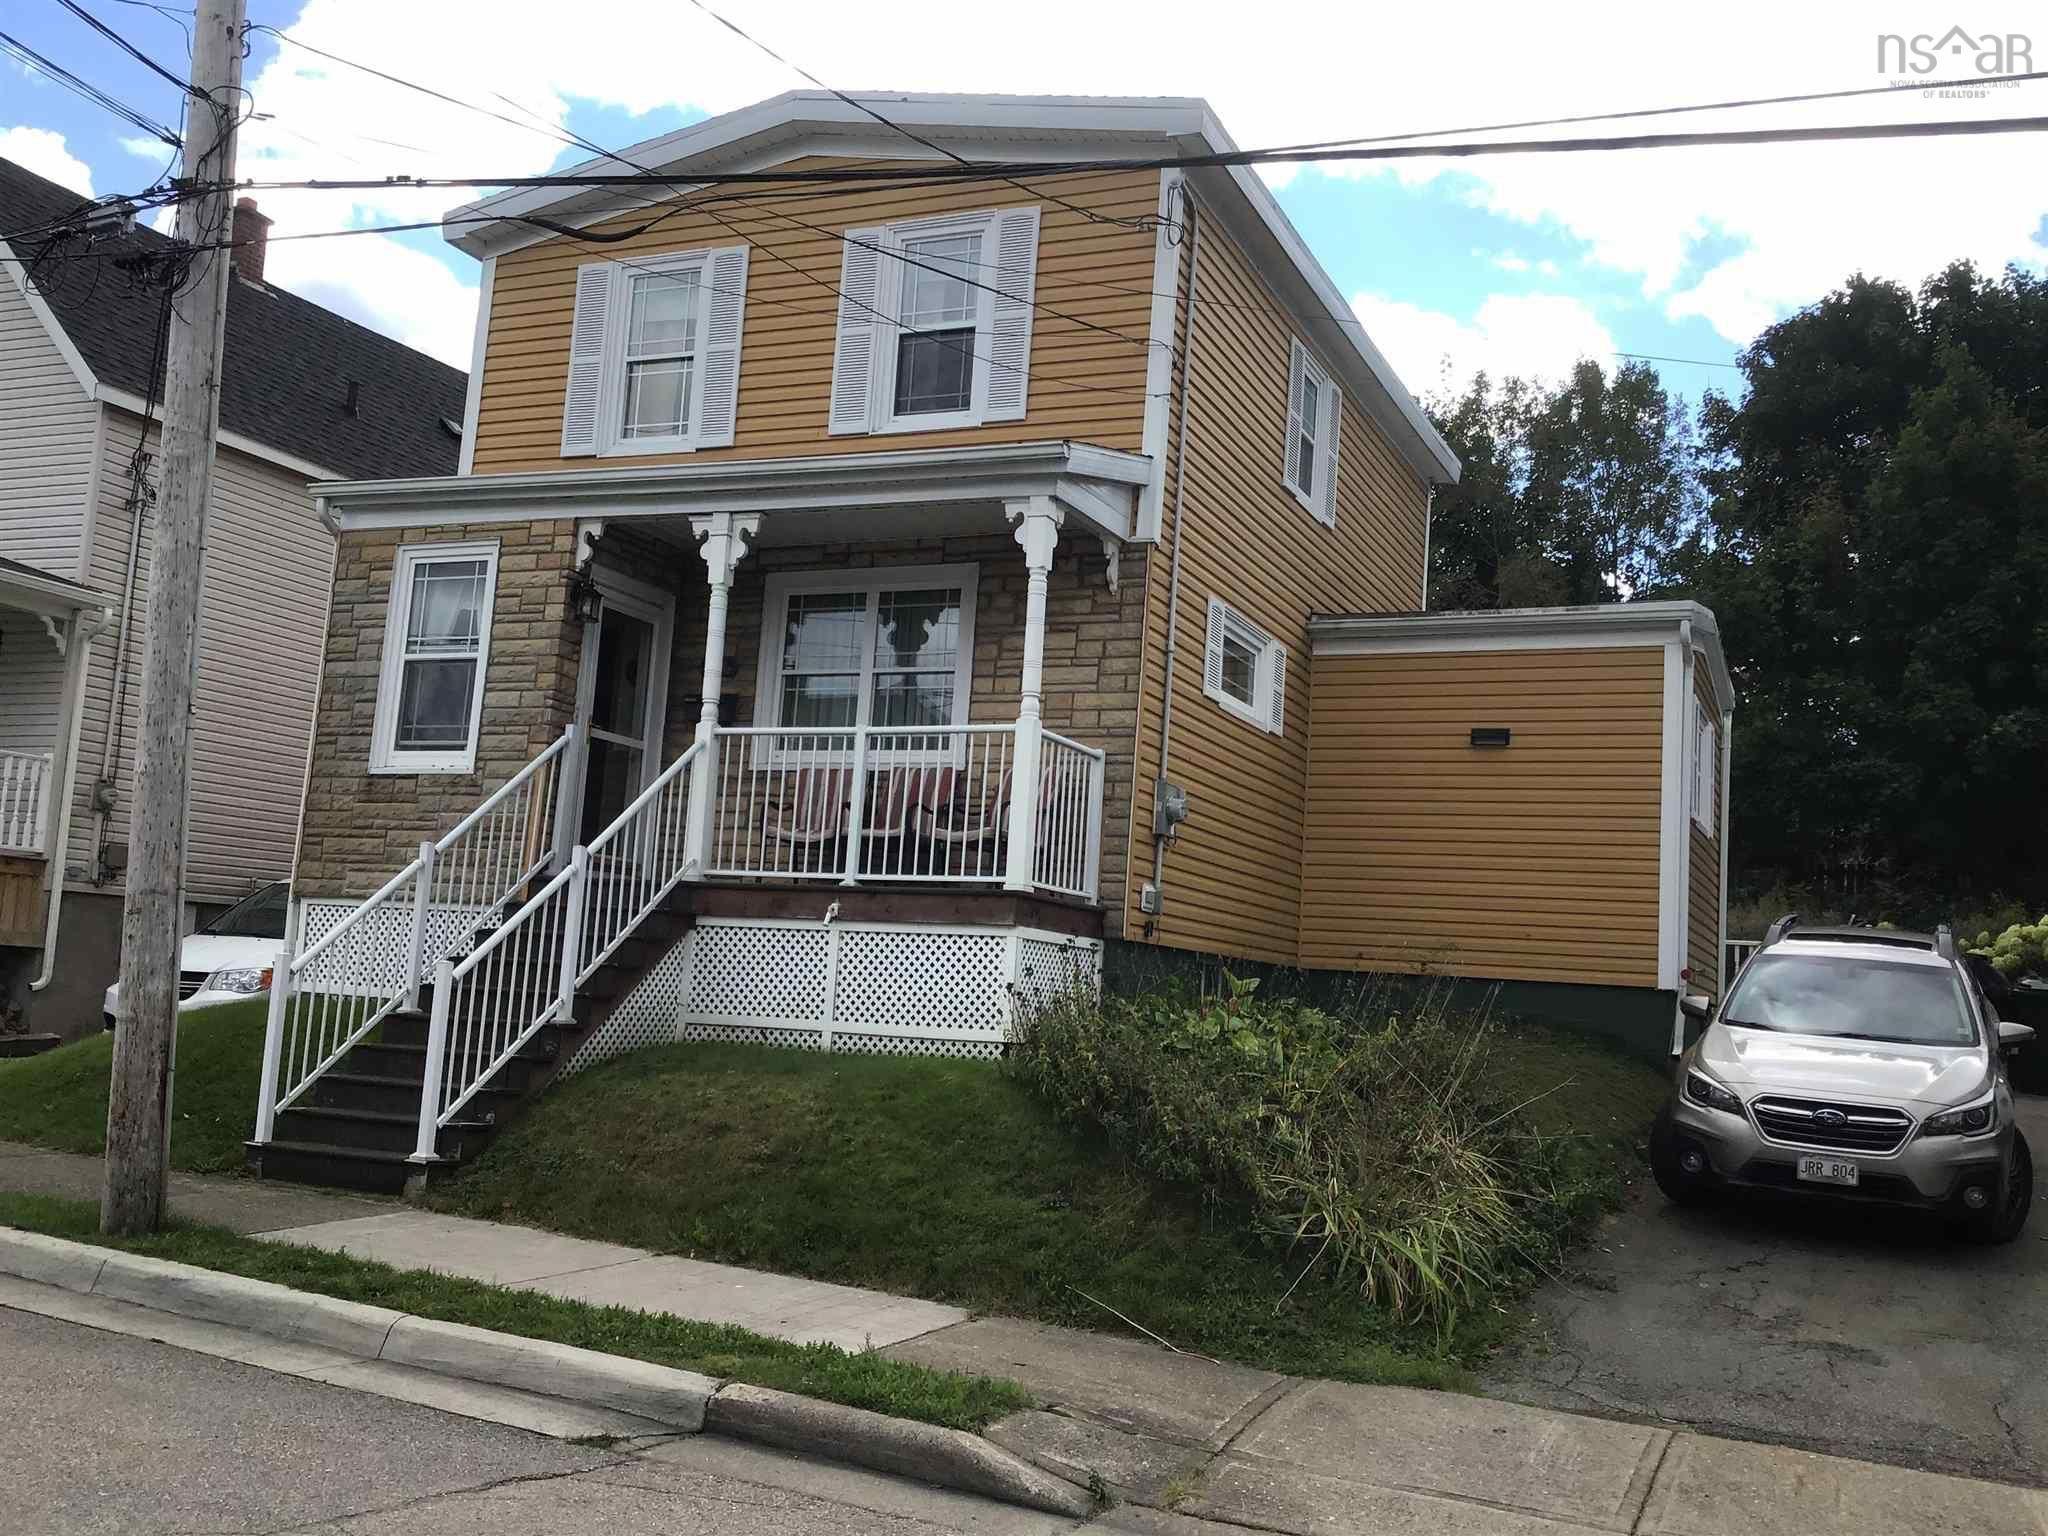 Main Photo: 106 Rockdale Avenue in Sydney: 201-Sydney Residential for sale (Cape Breton)  : MLS®# 202125496